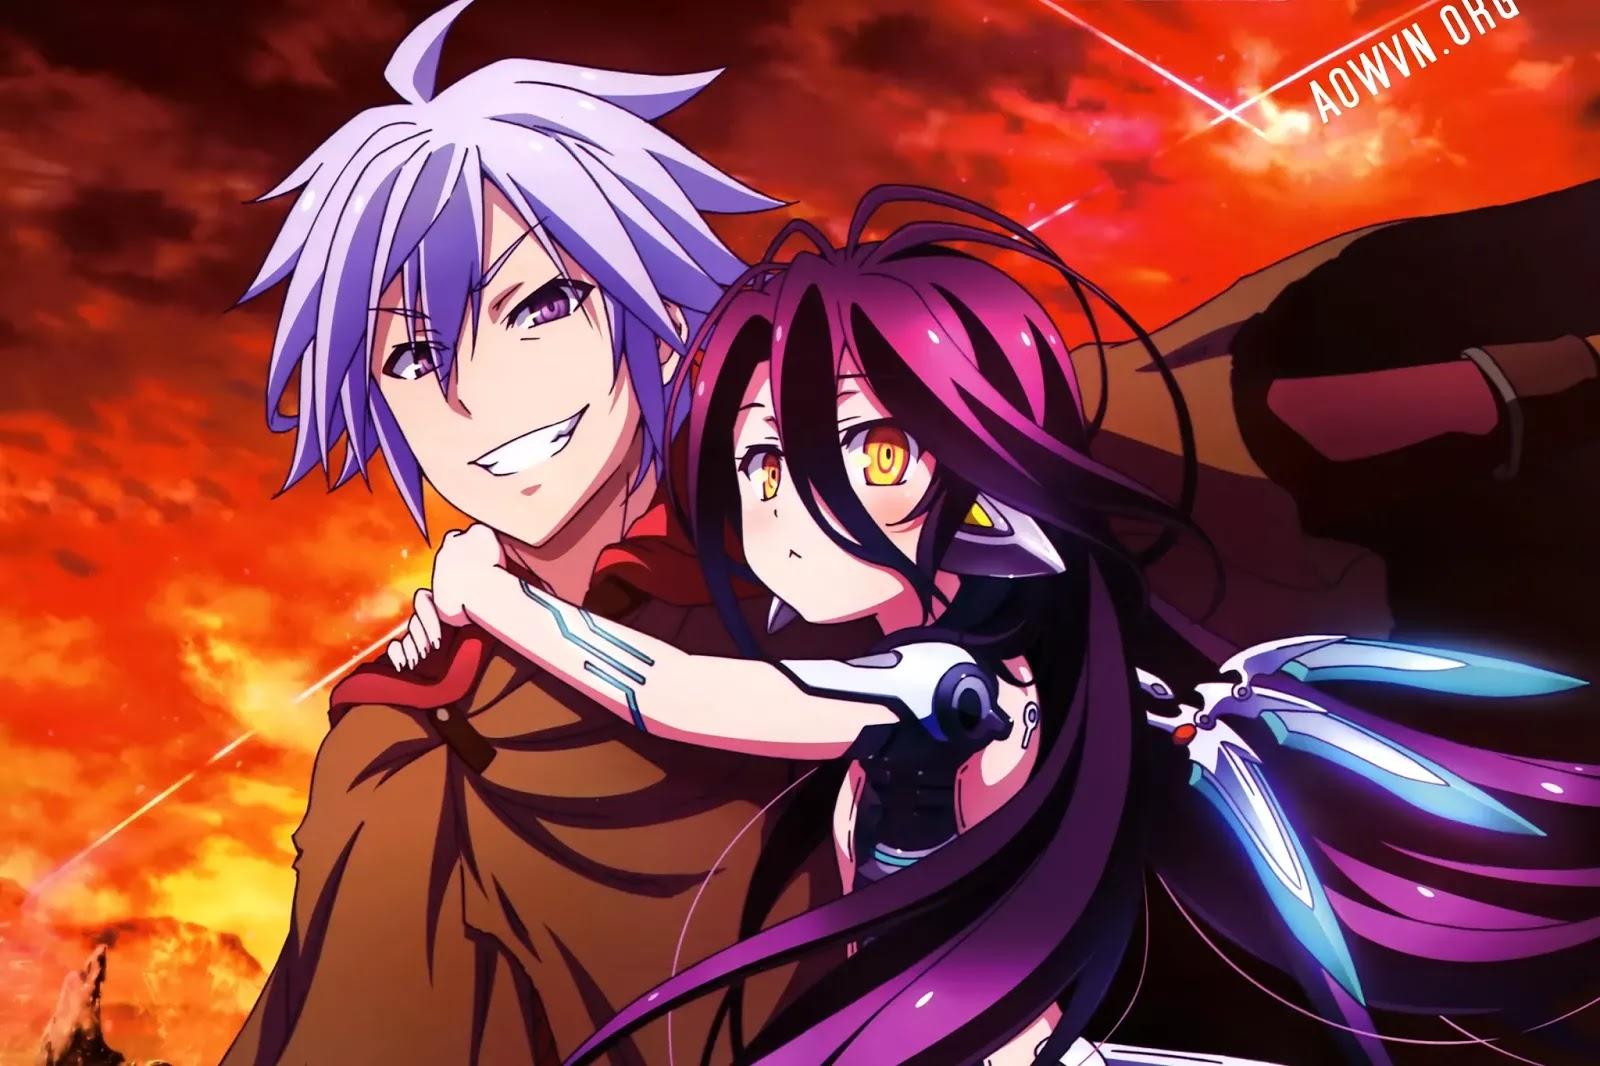 AowVN.org min%2B%25285%2529 - [ Anime 3gp Mp4 ] NO GAME NO LIFE: ZERO | Vietsub - Siêu phẩm